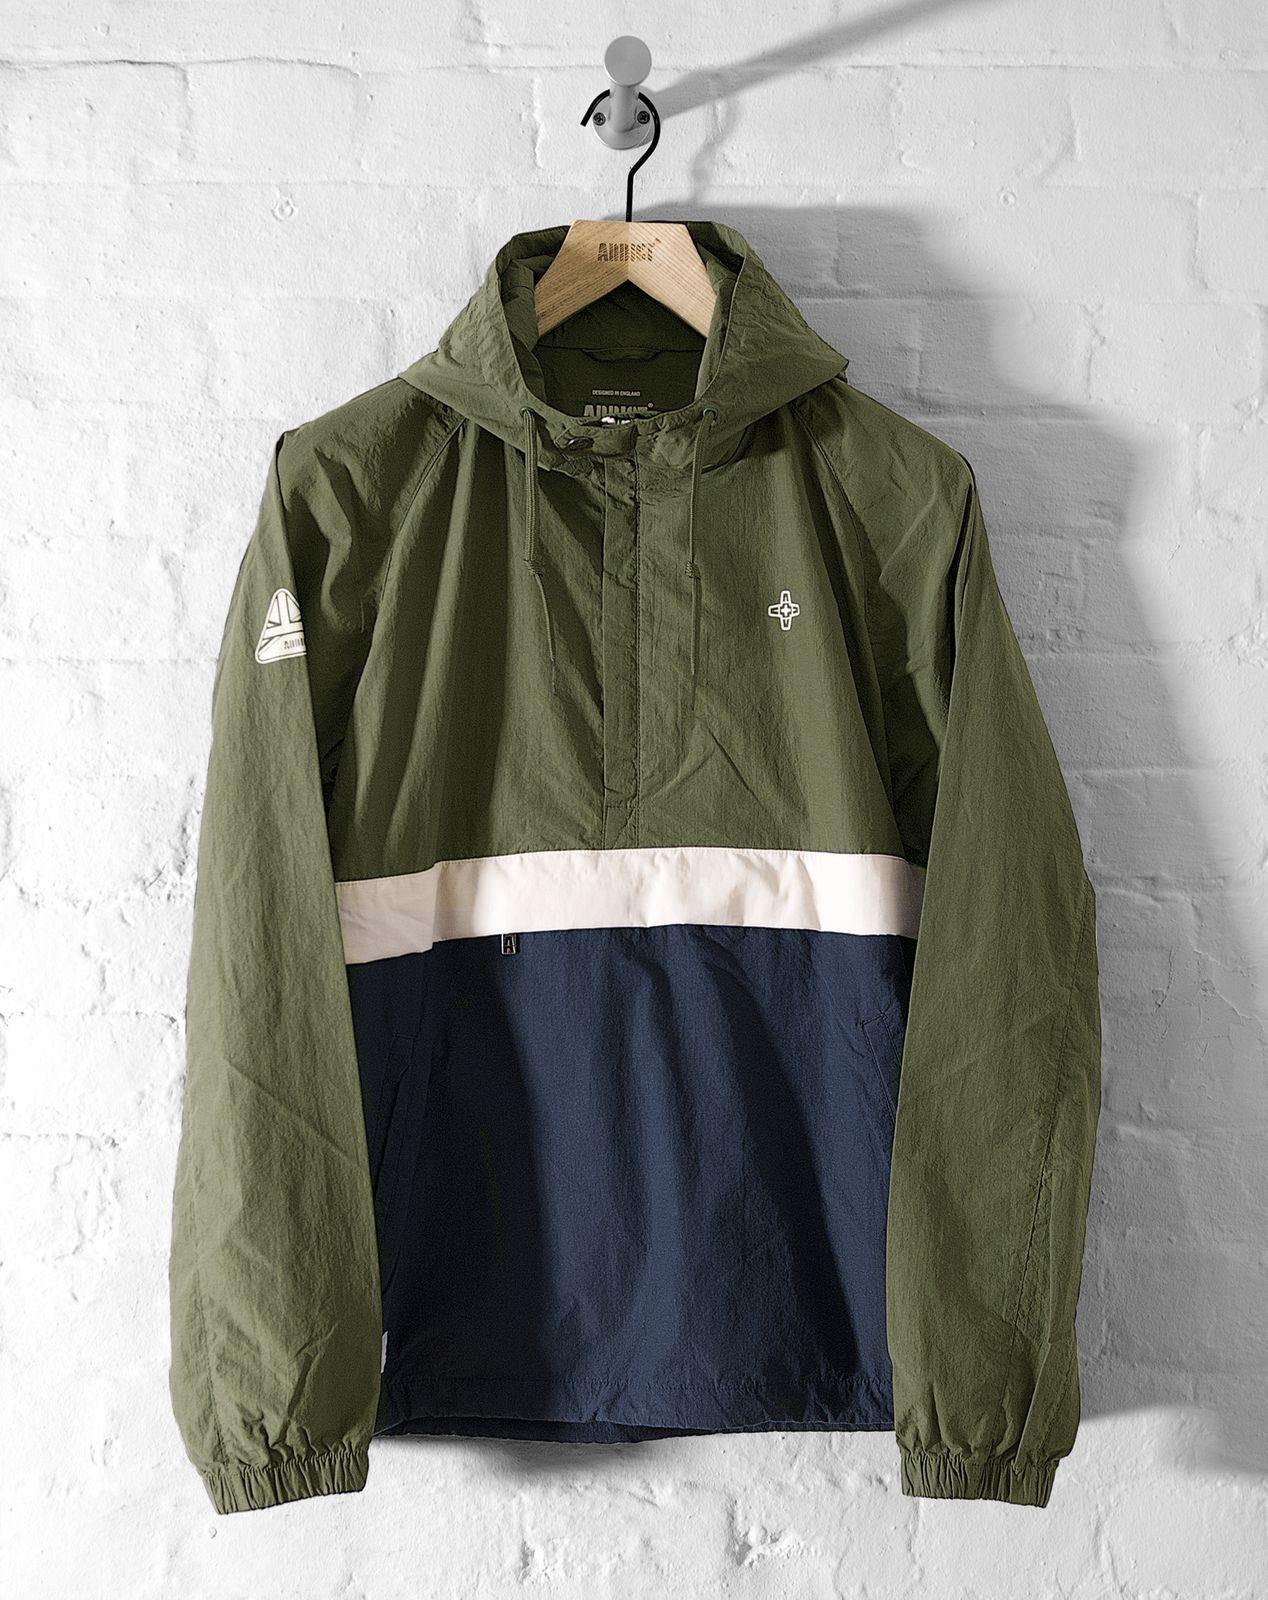 b86e600b4 Addict Mens Eavis Smock Half Zip Hooded Jacket Cotton/Nylon 80's Style New